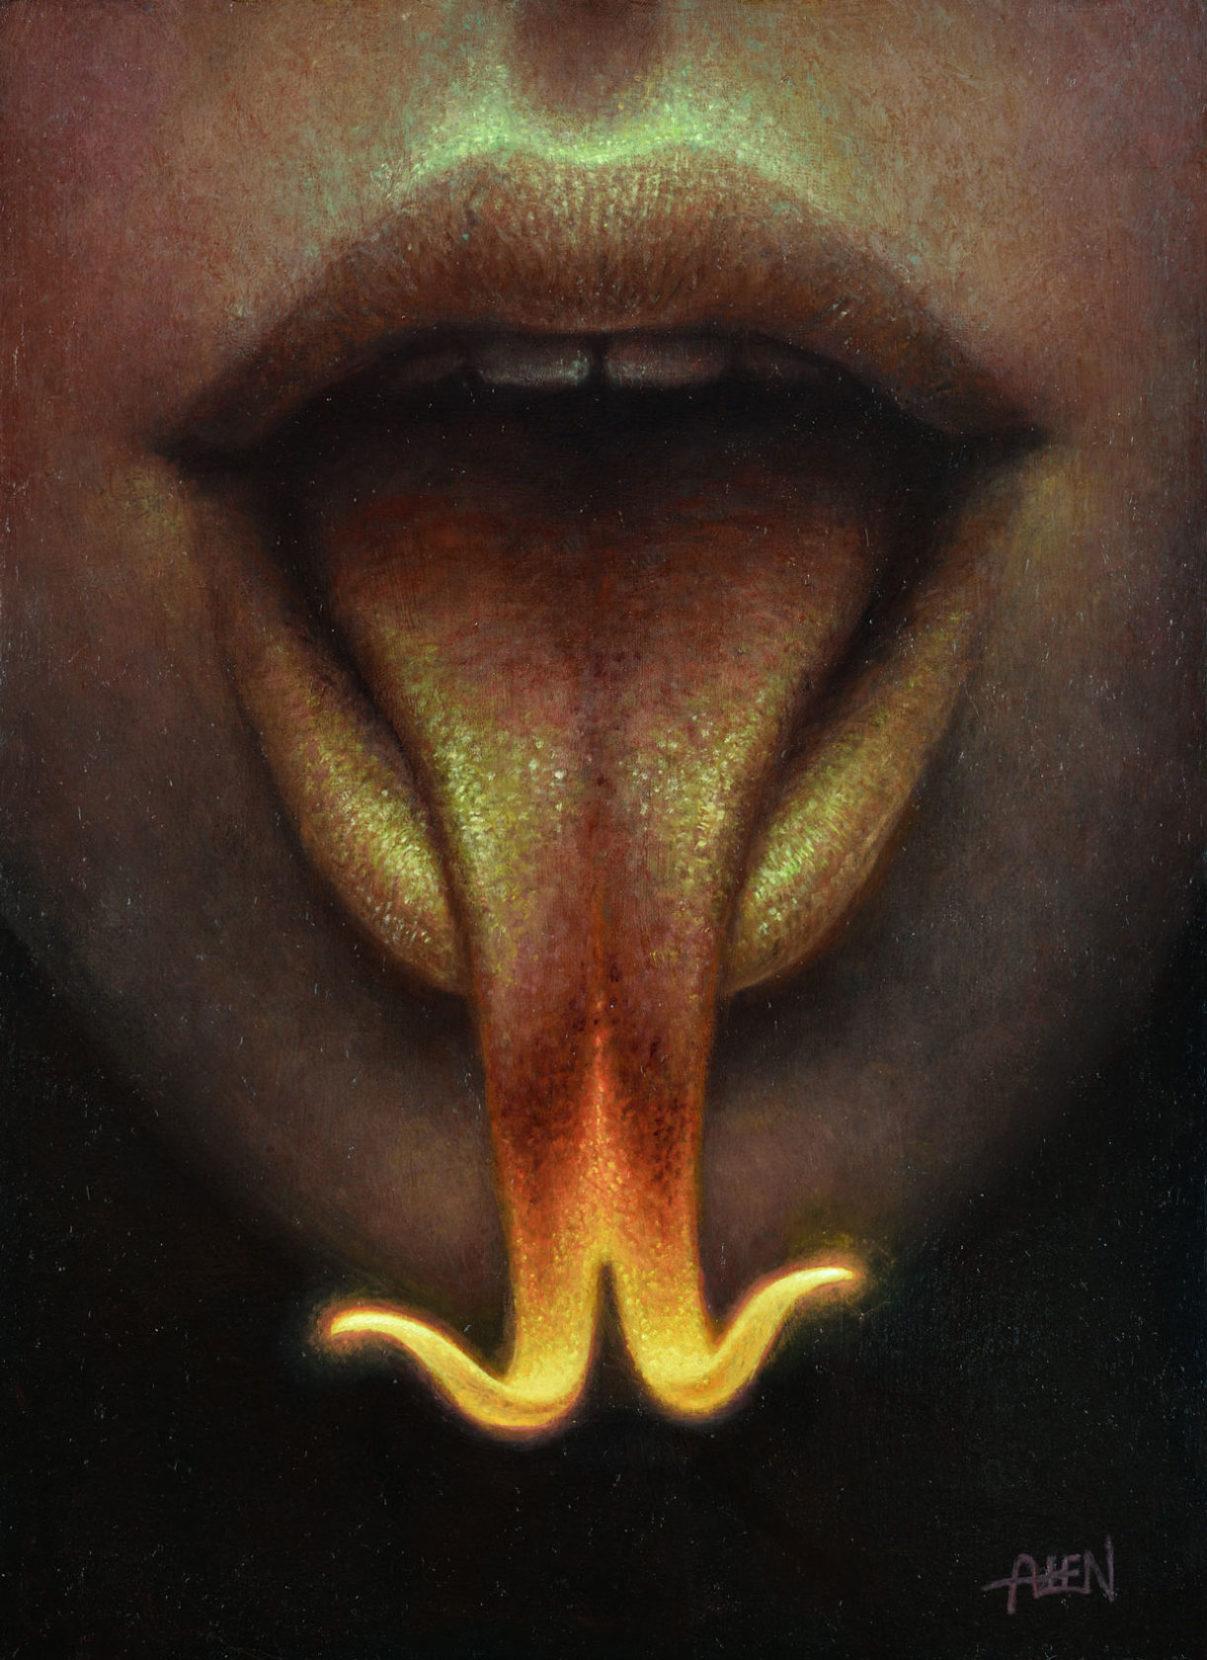 Arteclat - Paradisial Hell Tomasz Alen Kopera